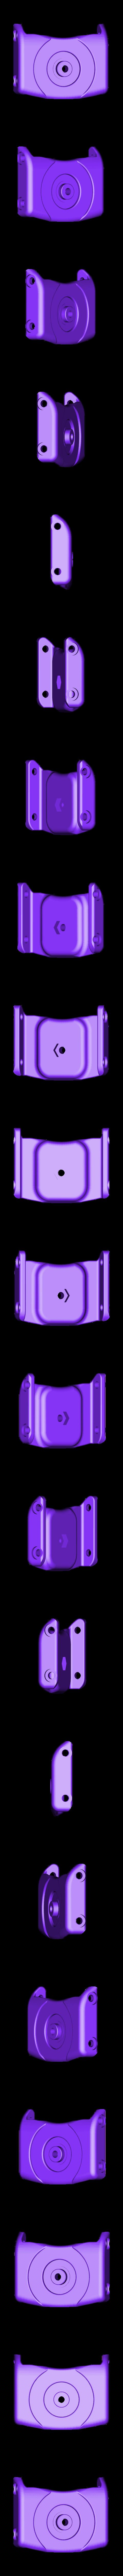 i101_to_MX28_link.STL Download free STL file Poppy Torso • 3D printable model, PoppyProject